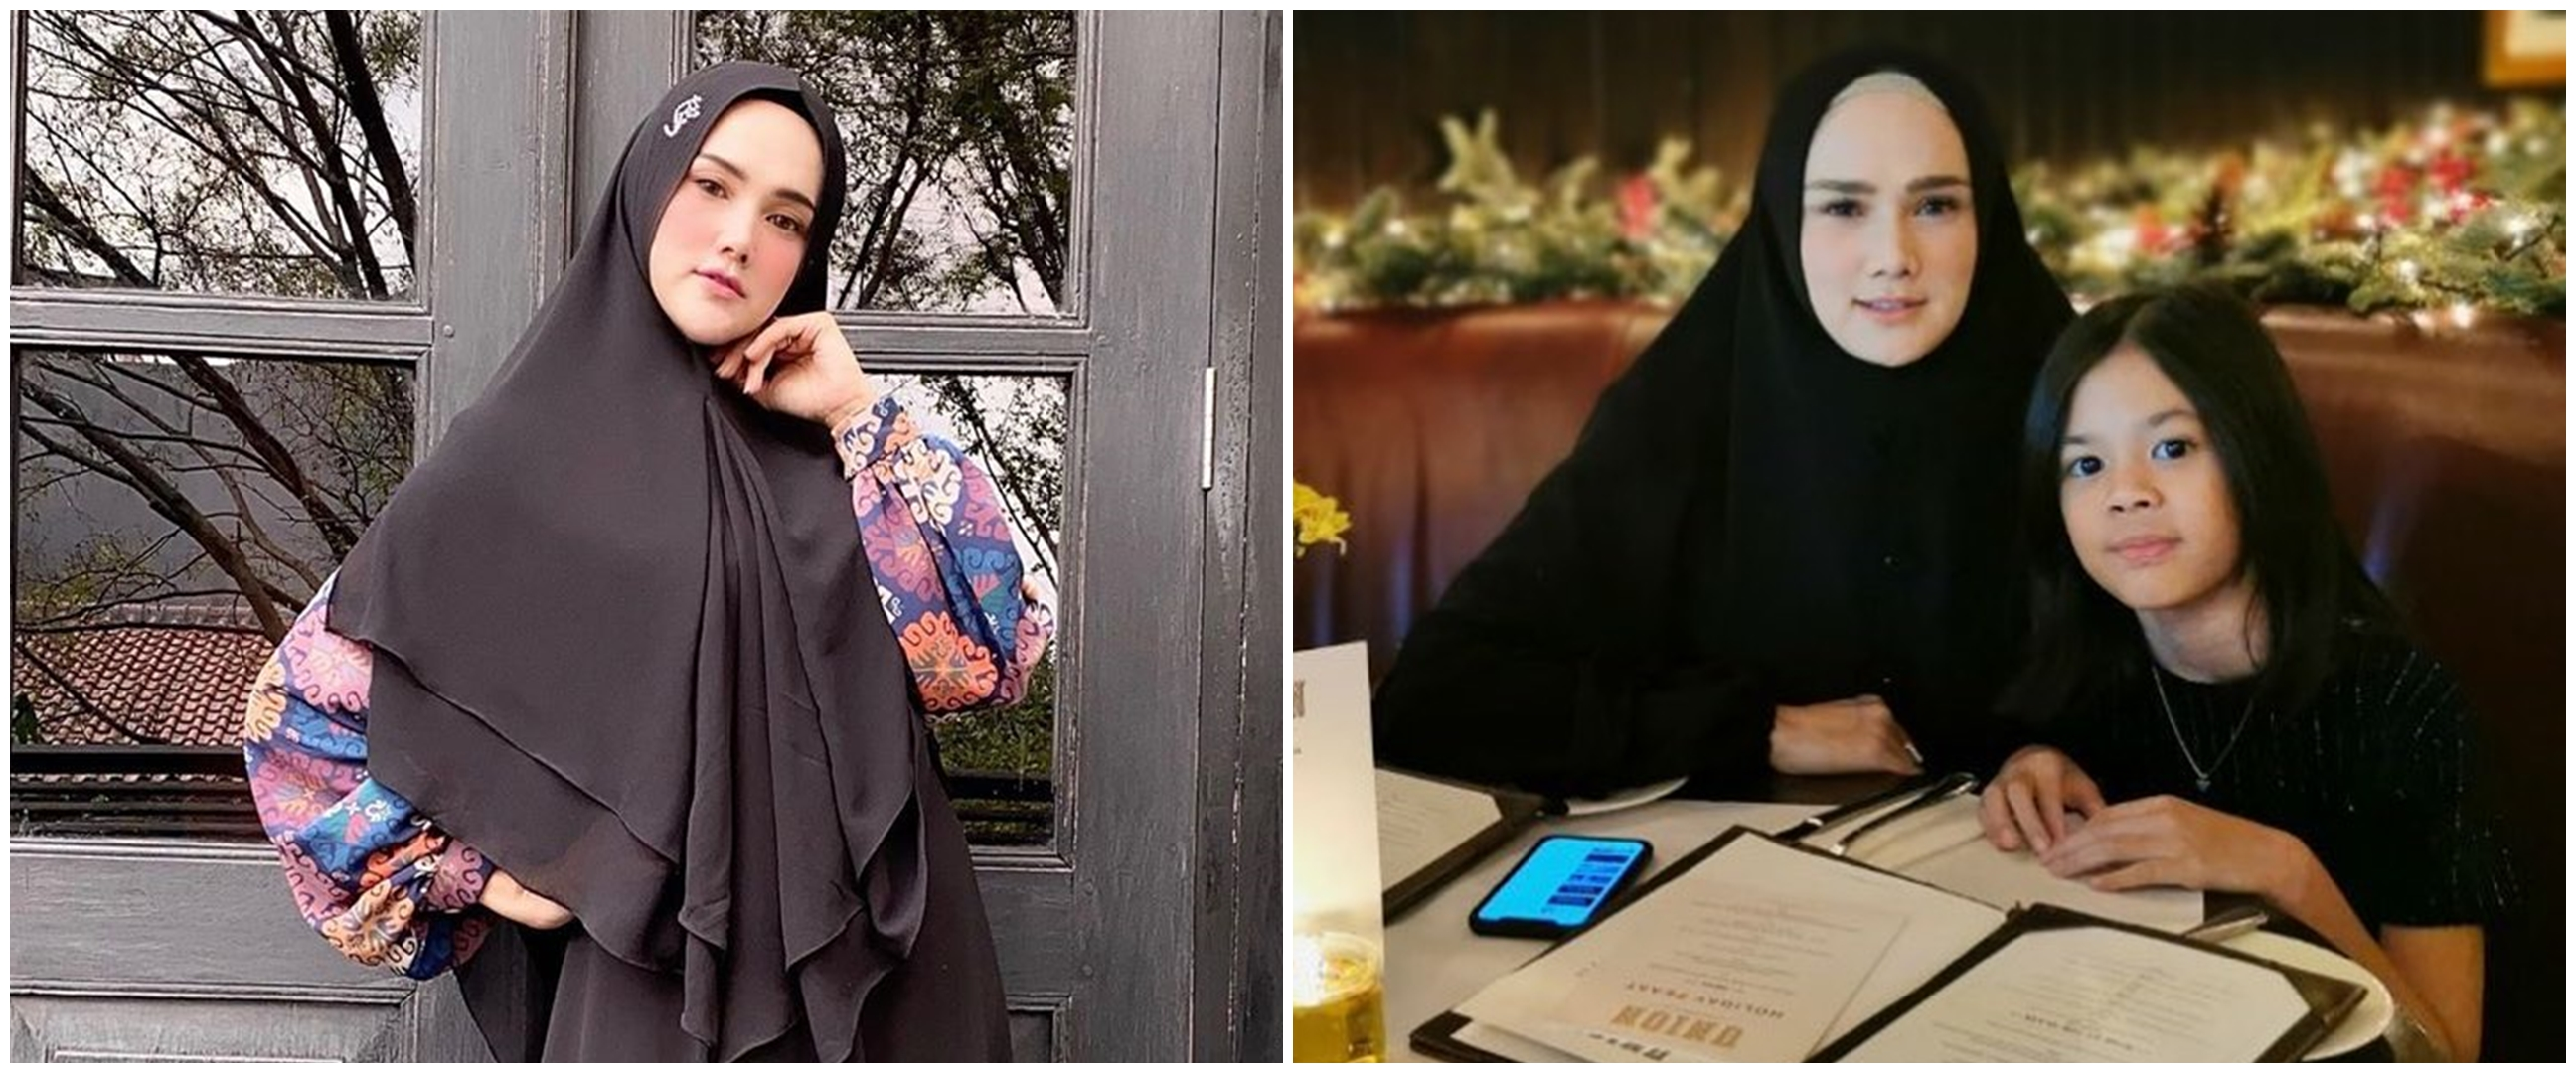 Mulan Jameela posting foto salat bareng, paras anak bikin salfok